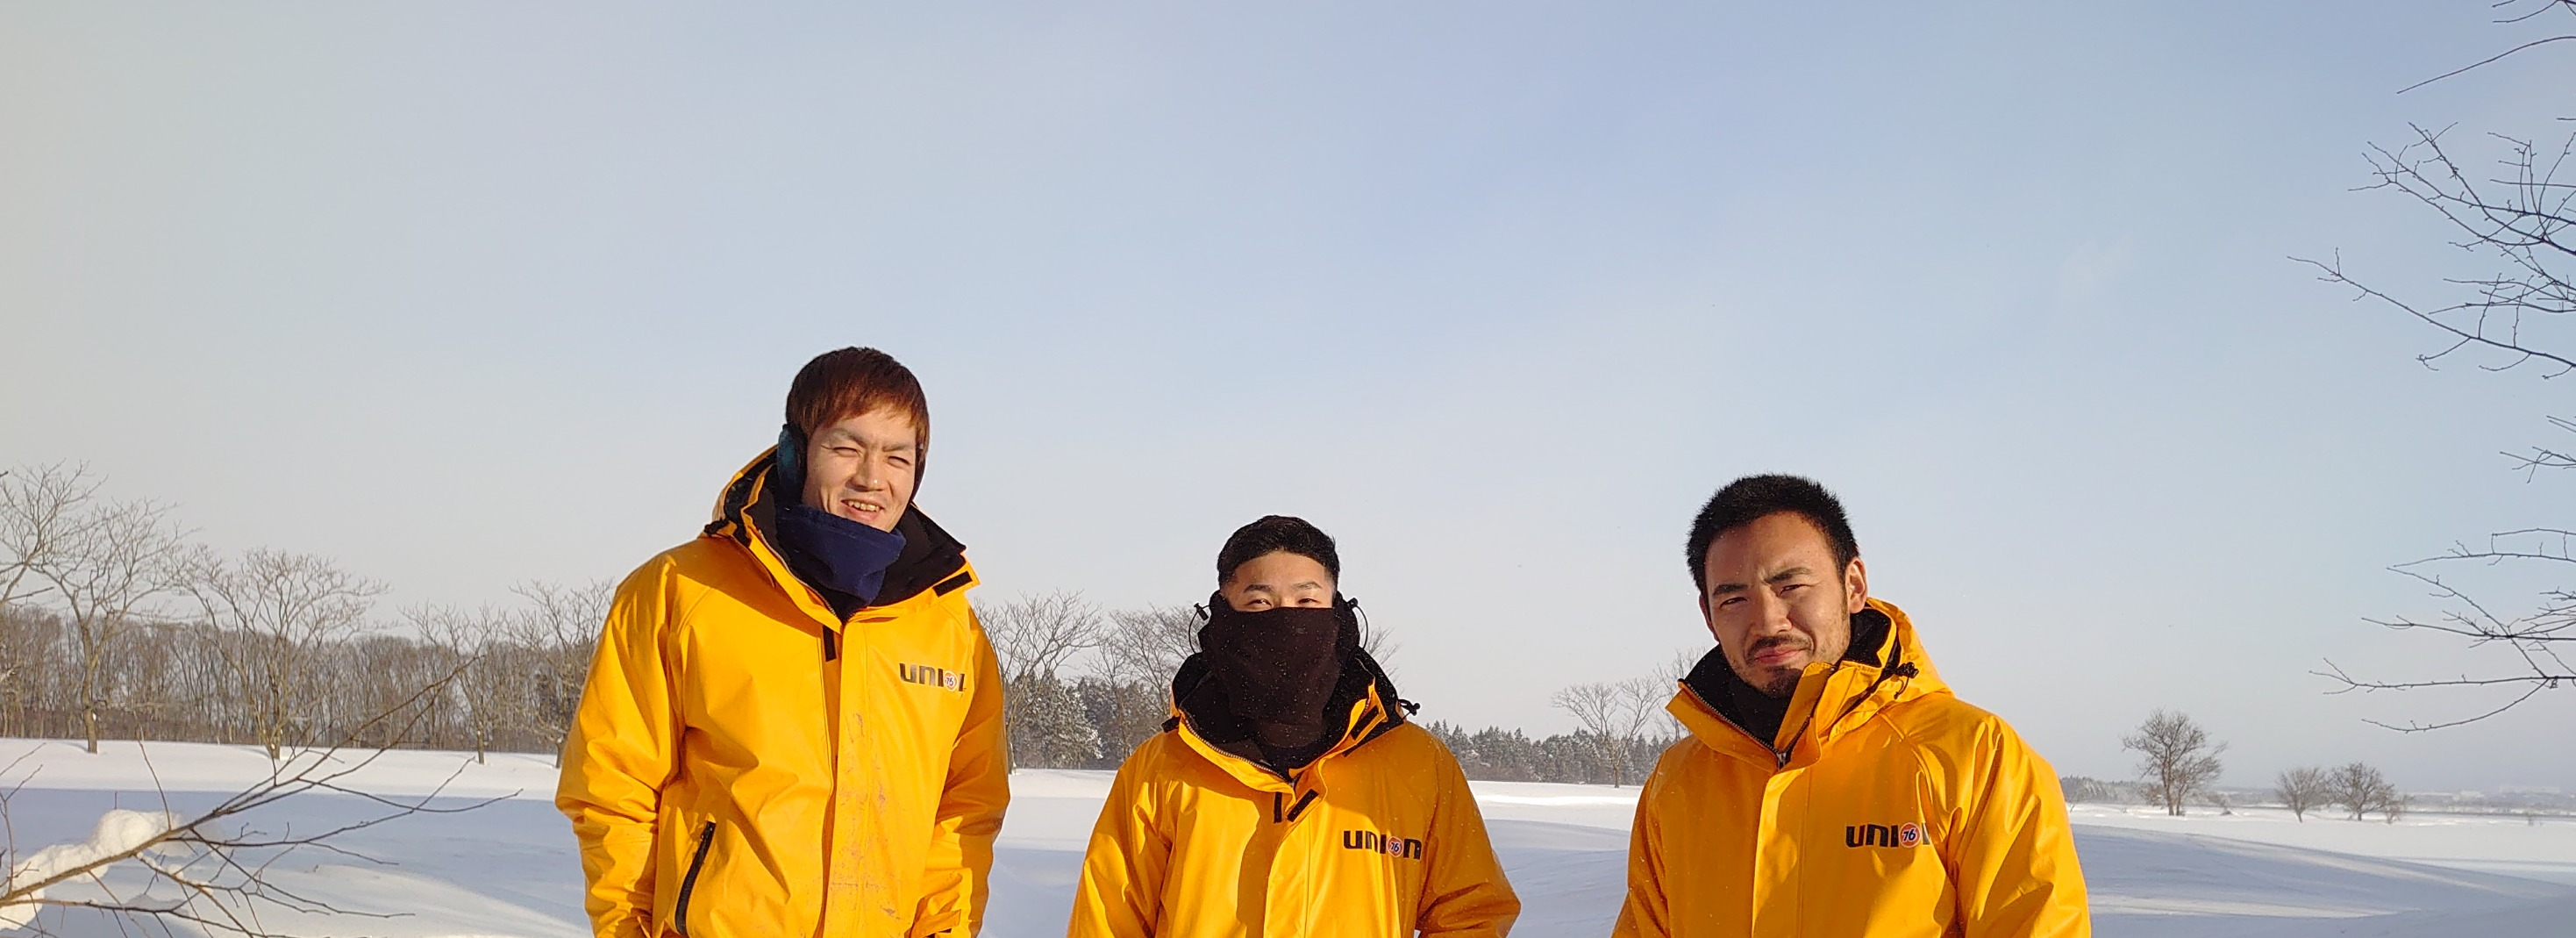 our team 仲間たち